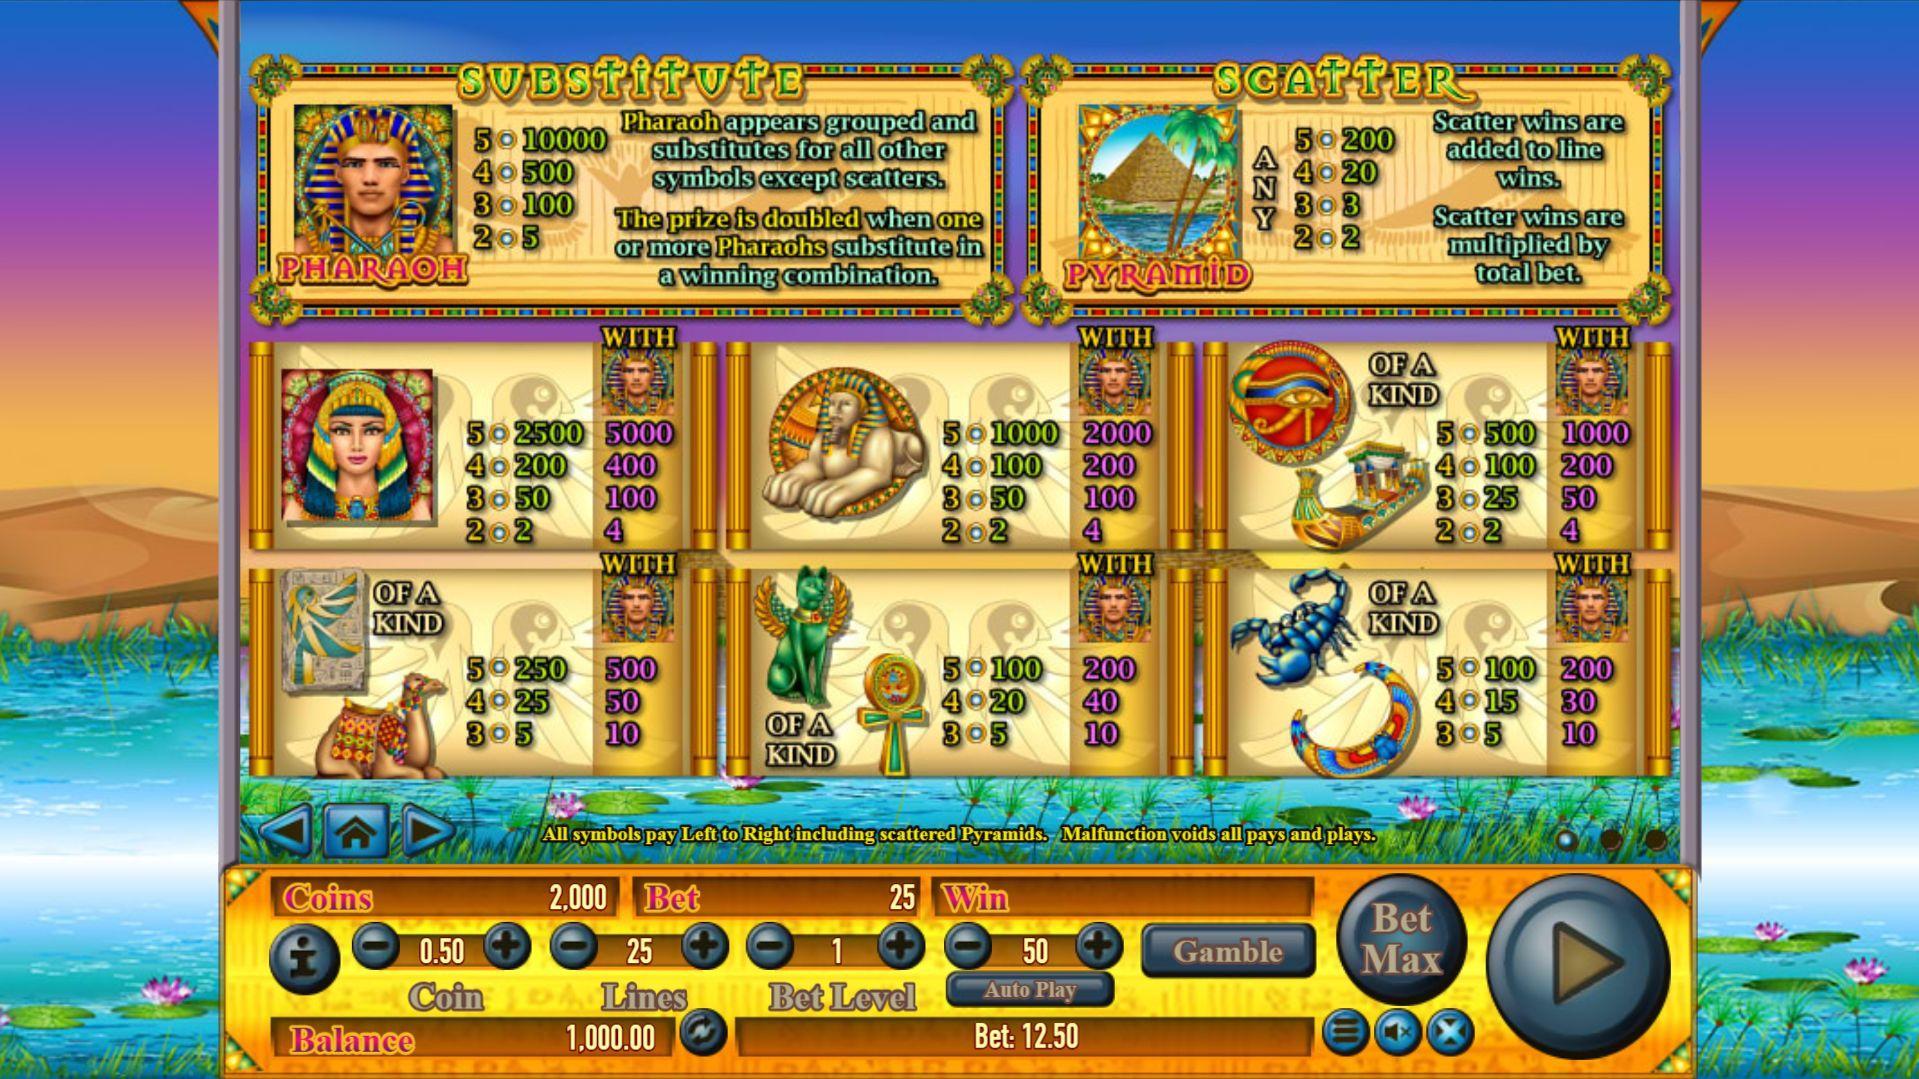 Autoplay casino Brasil bets 14720